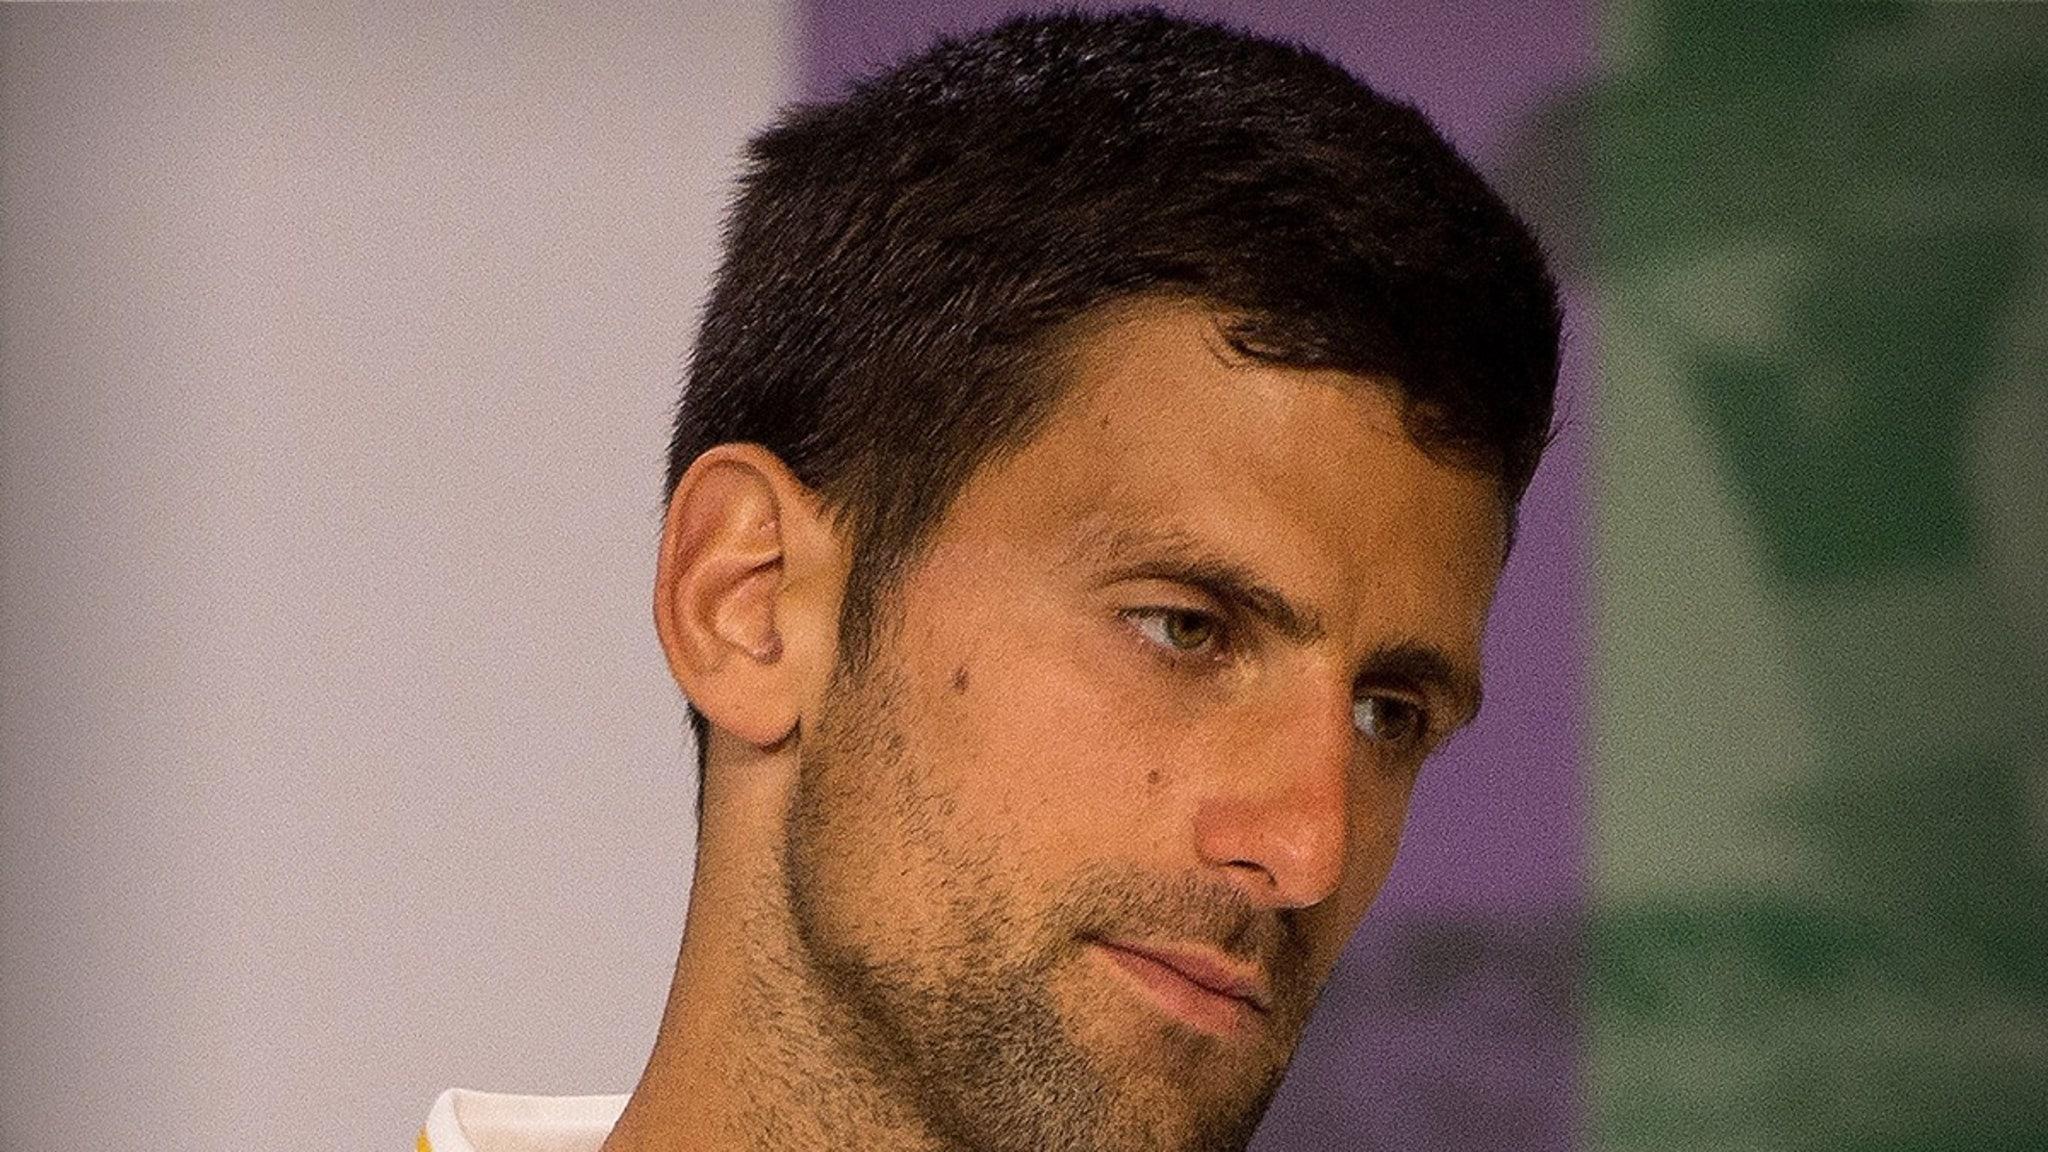 Novak Djokovic I'm Victim of COVID-19 'Witch Hunt' ... After Doomed Tourney